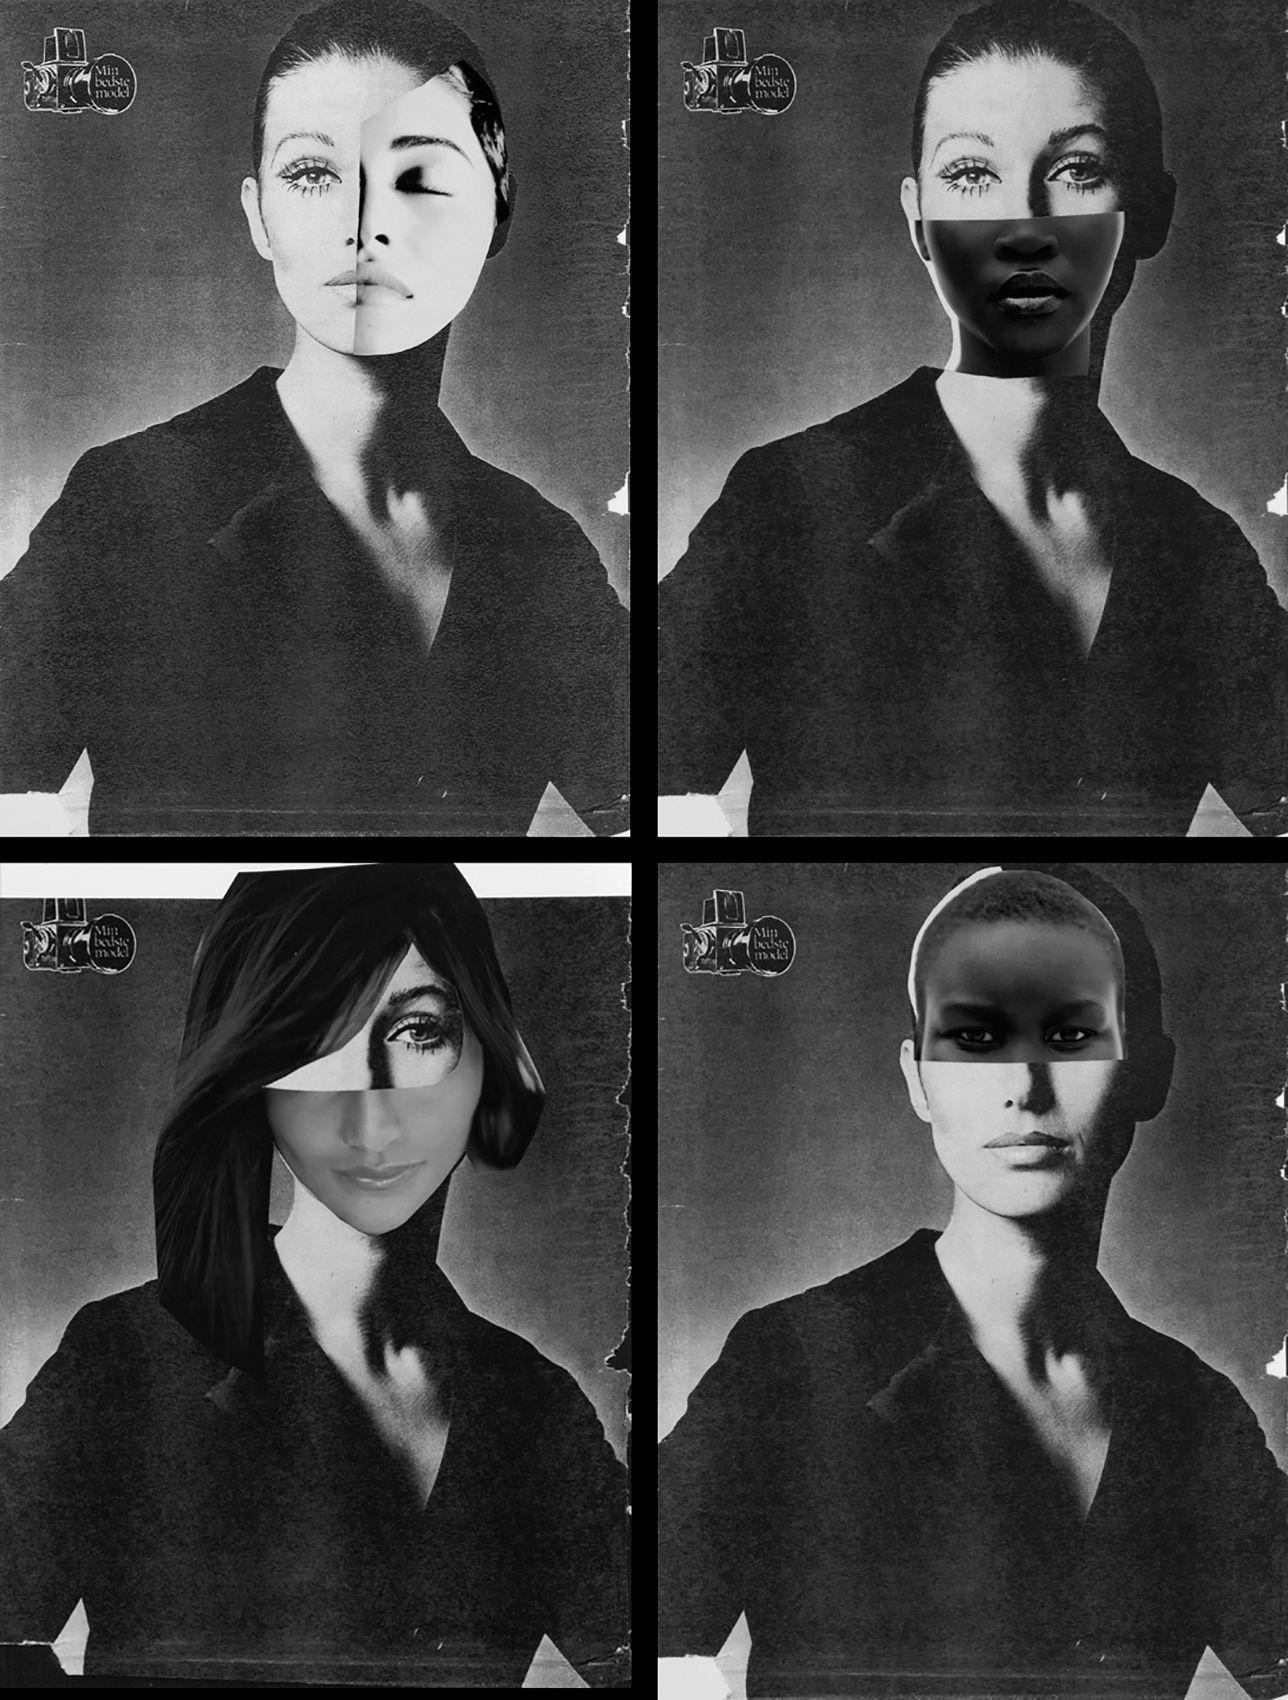 Collage_Combo2_x.jpg